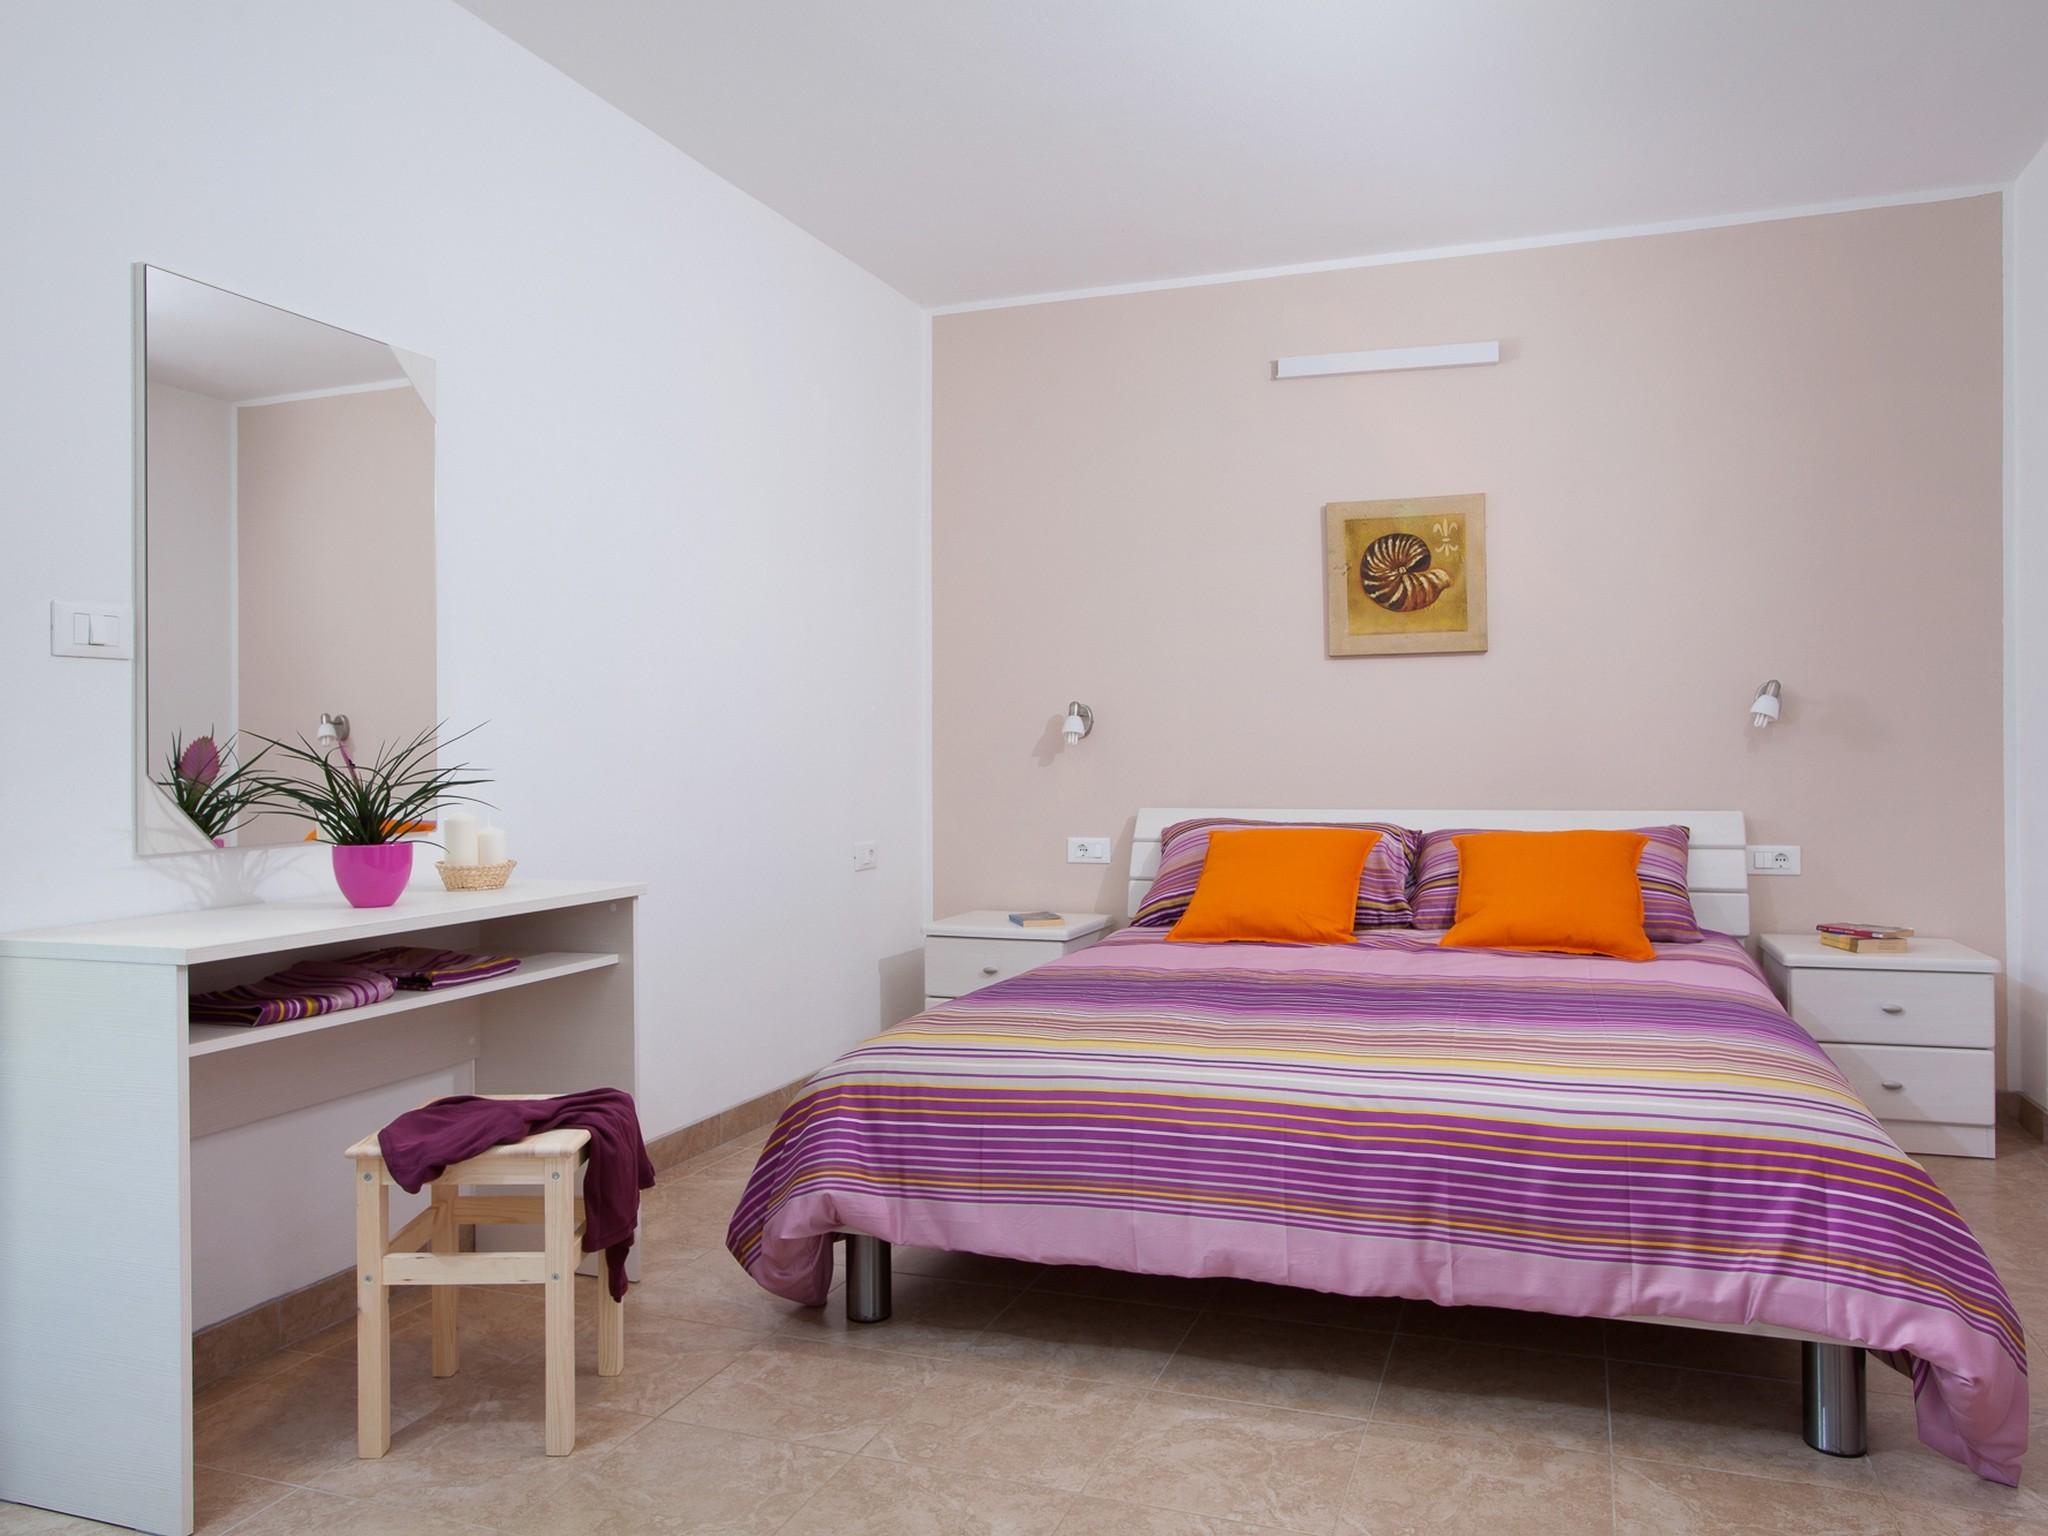 Ferienhaus Bruno, Kua za odmor s bazenom (2204668), Mugeba, , Istrien, Kroatien, Bild 11